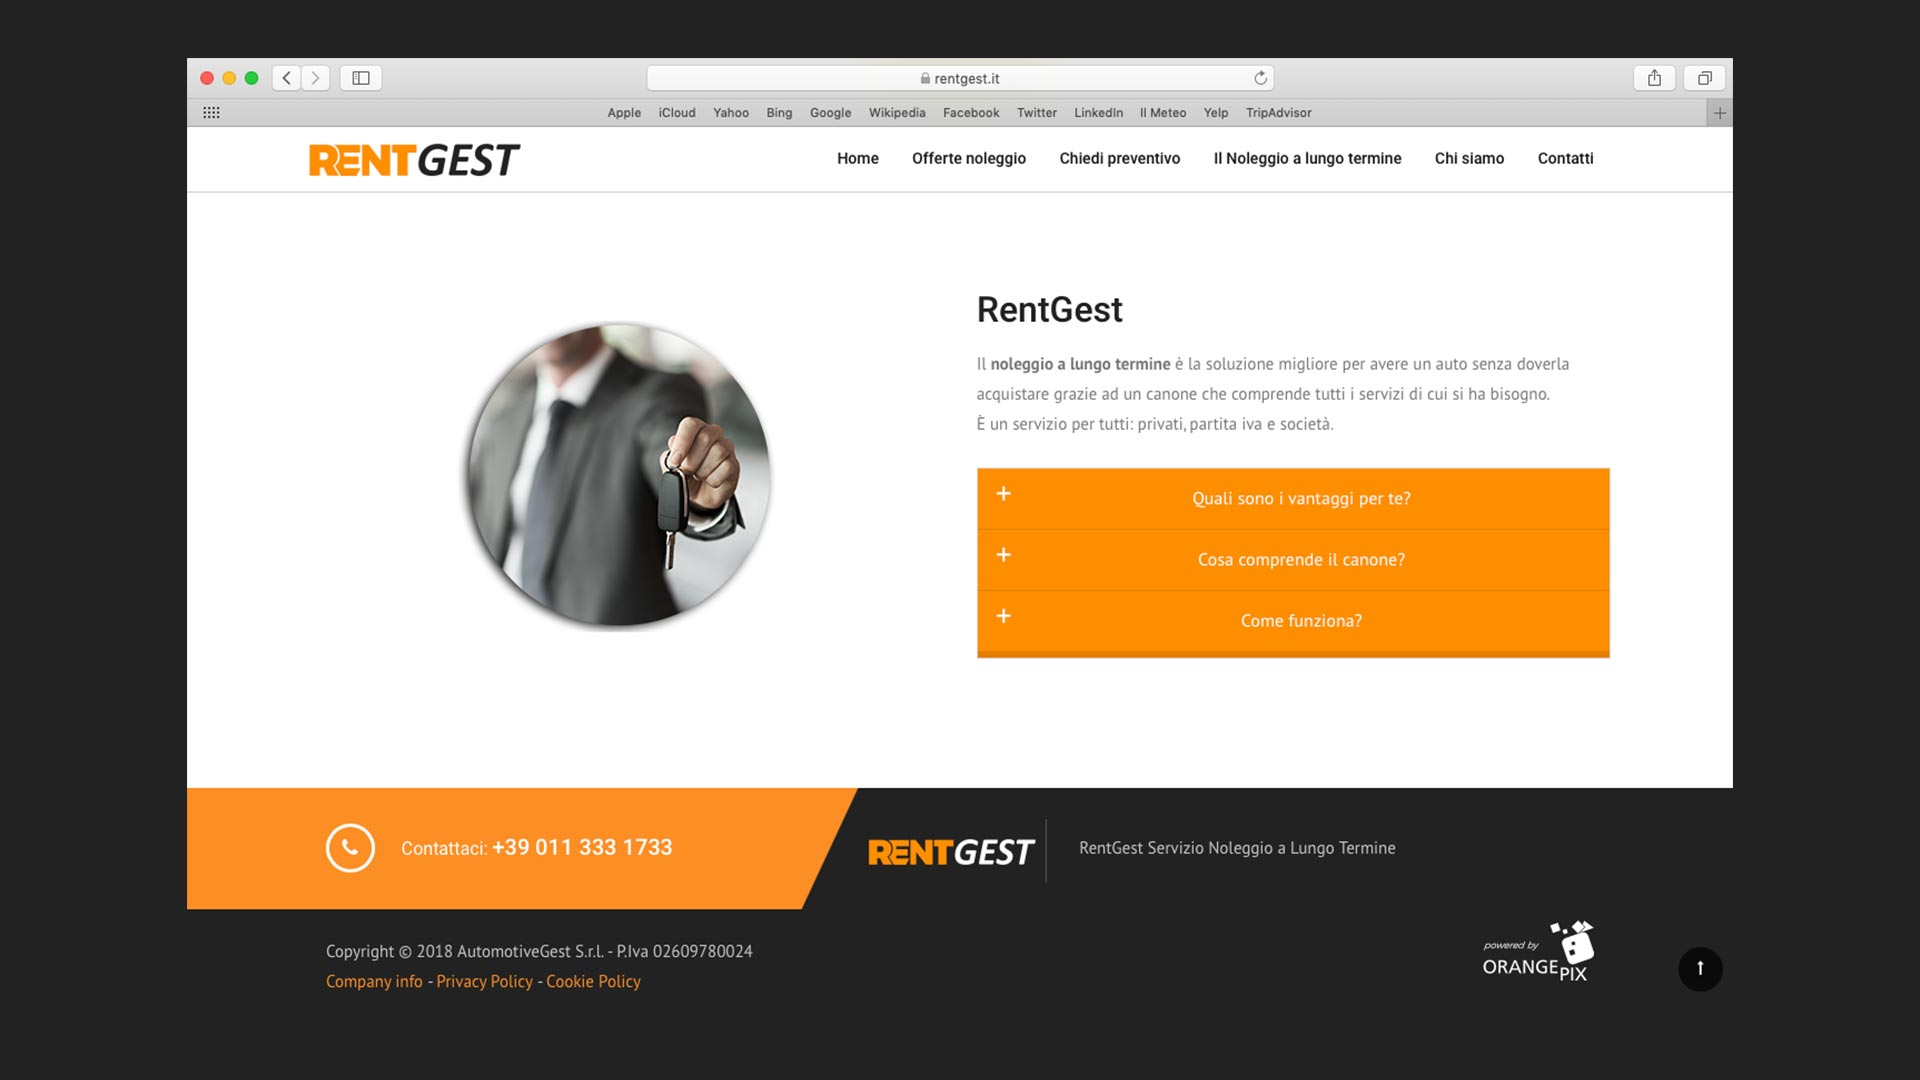 Interno-2-sito-web-Rentgest - OrangePix